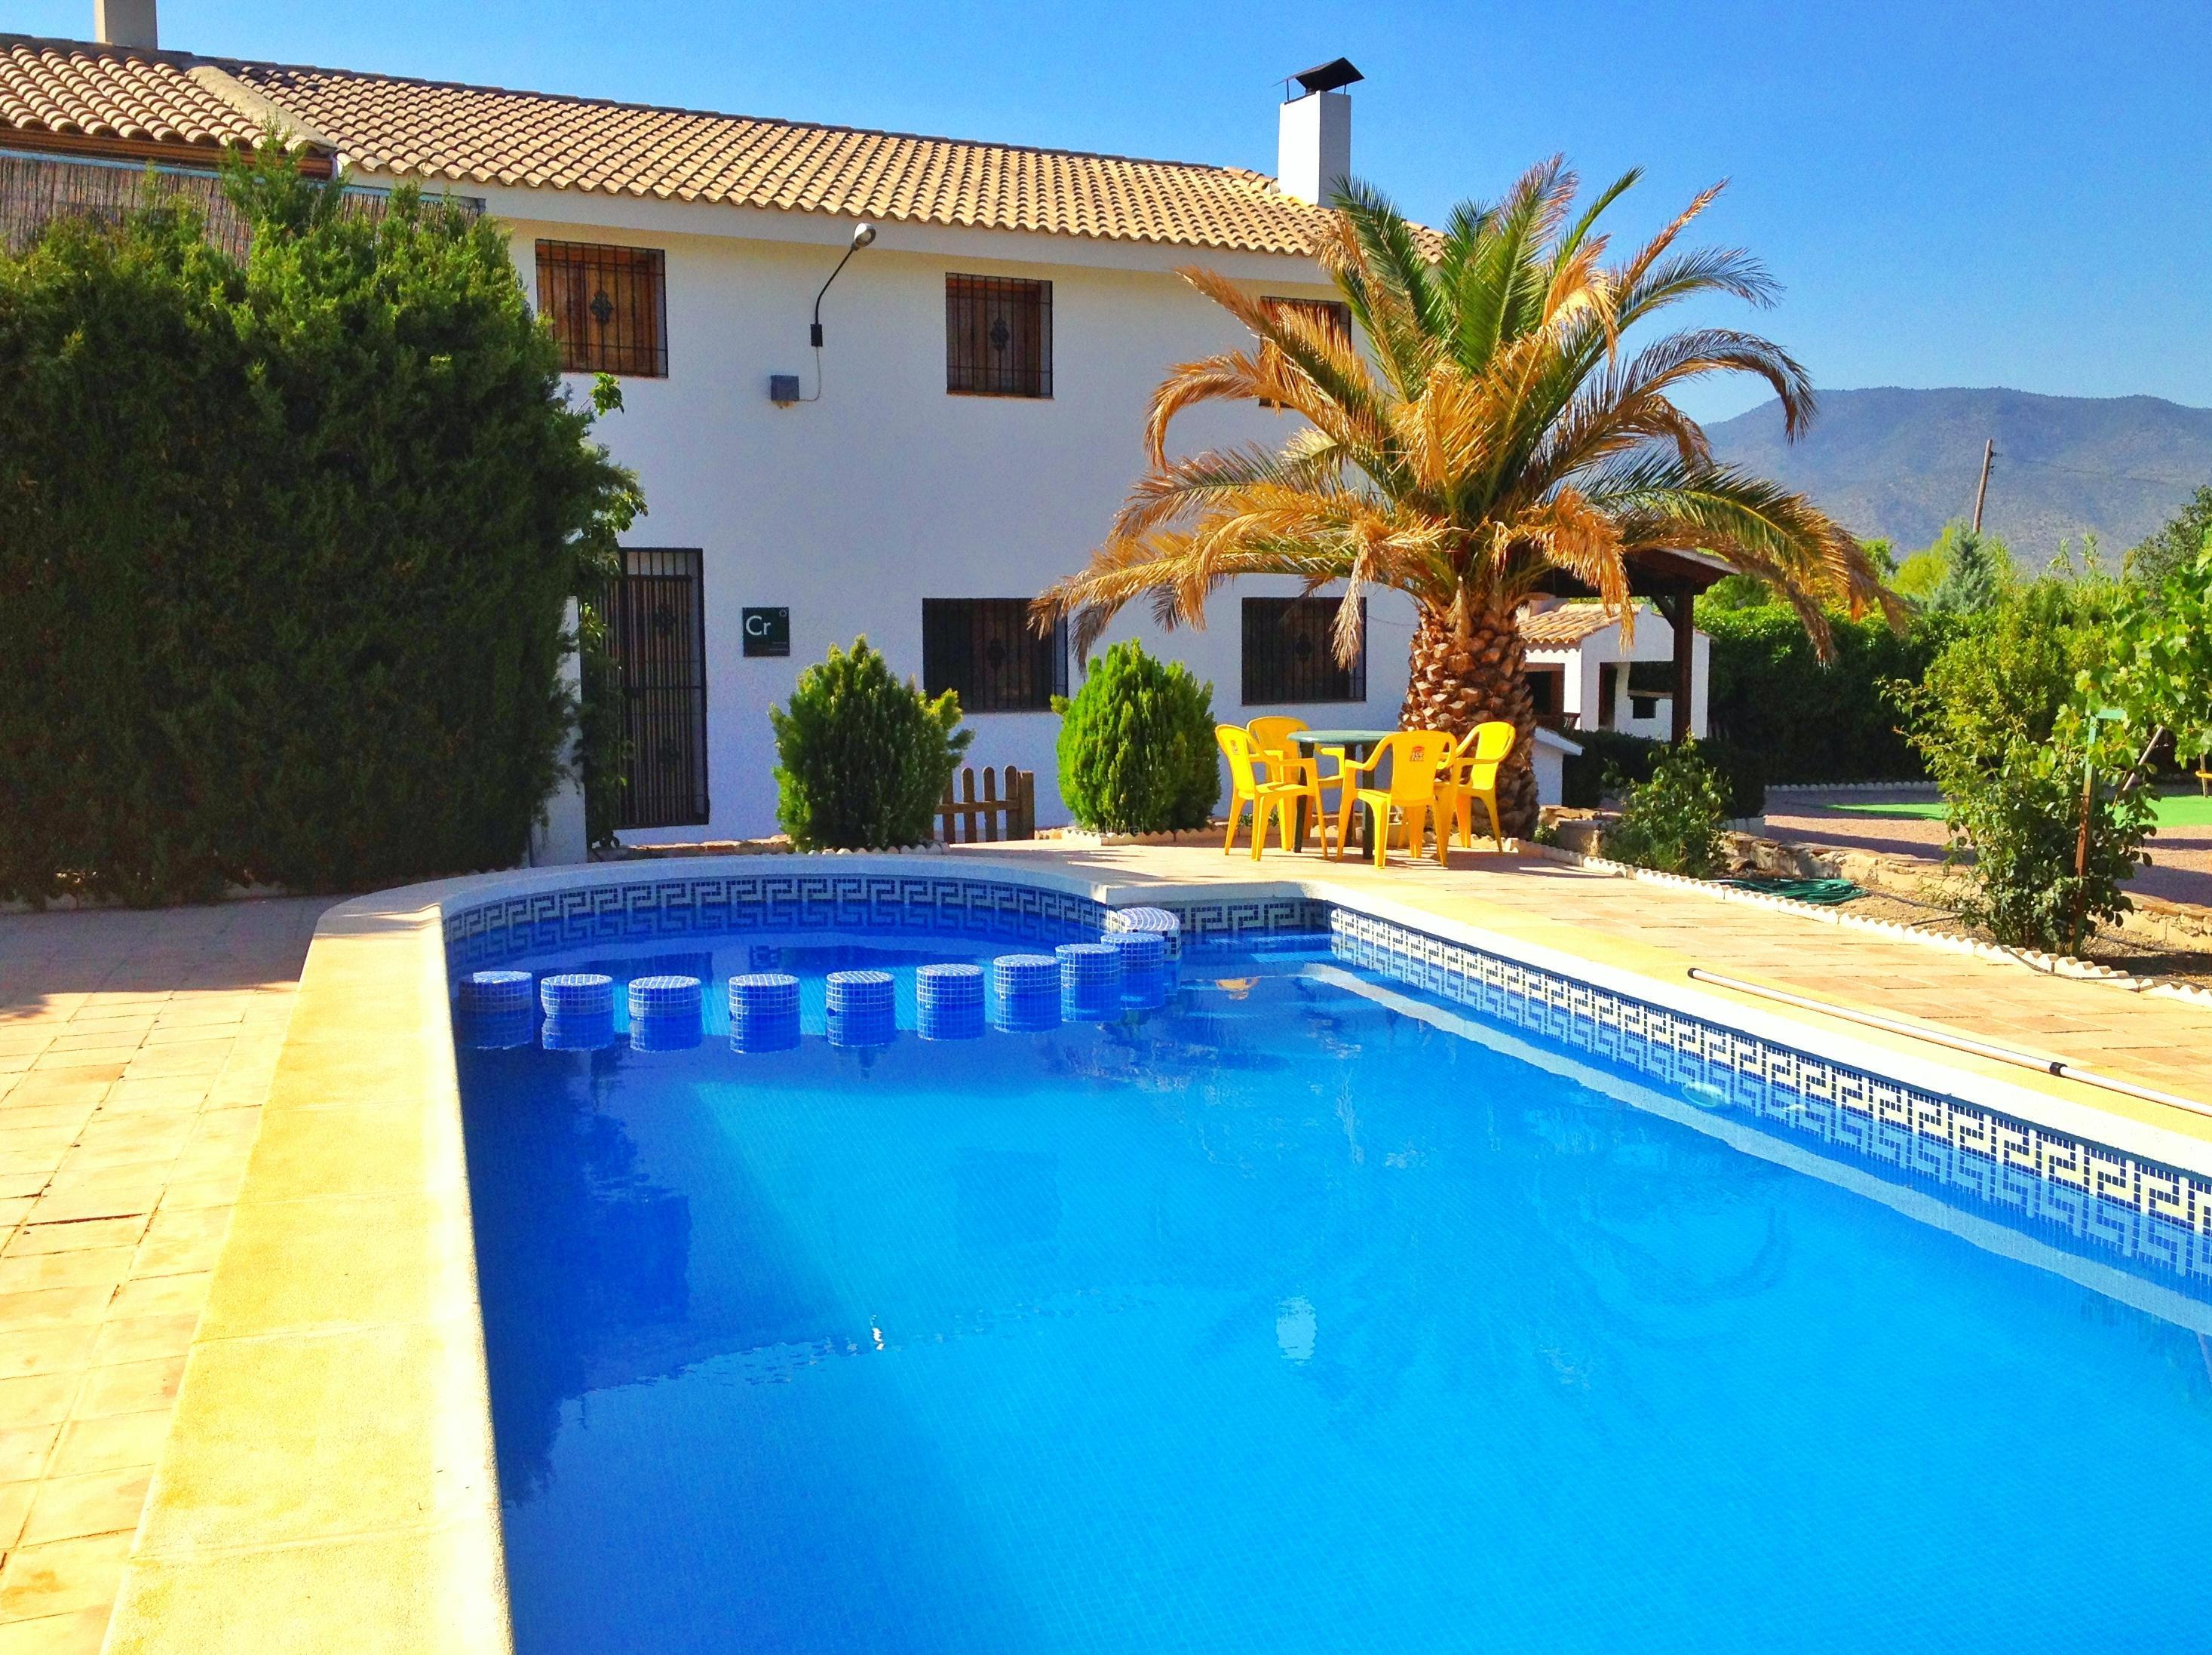 Fotos de casa vuelta del carril murcia caravaca de la - Casa rural murcia piscina climatizada ...